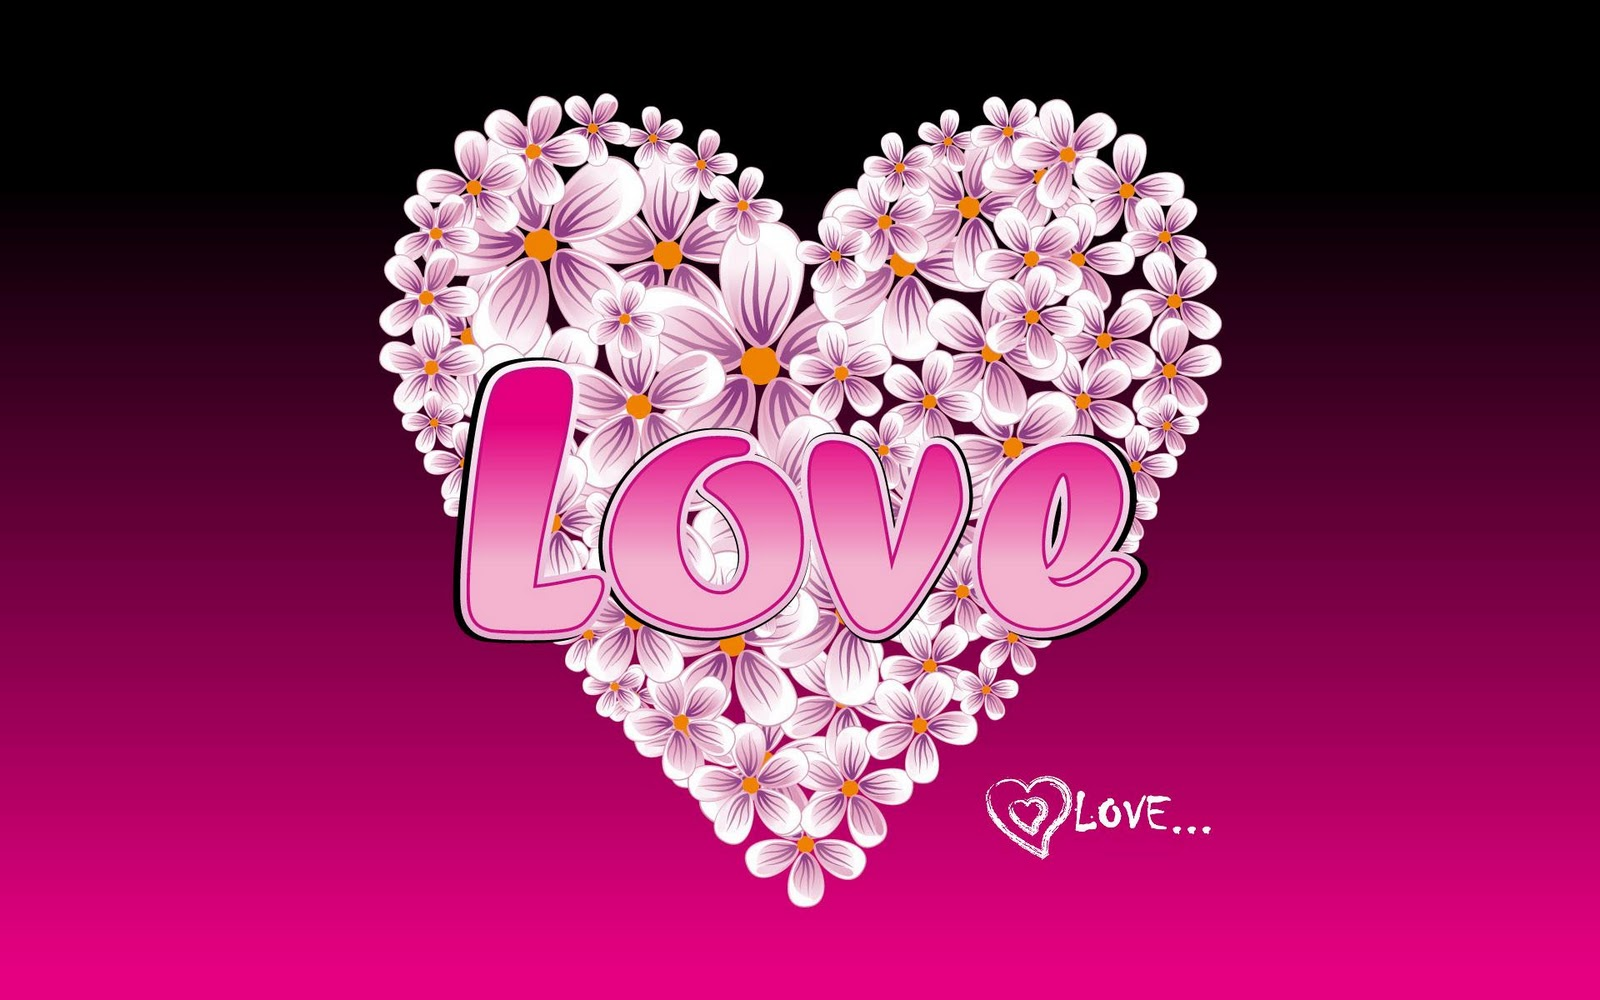 Touch my heart 25 beautiful pink heart wallpapers - Heart to heart wallpaper ...